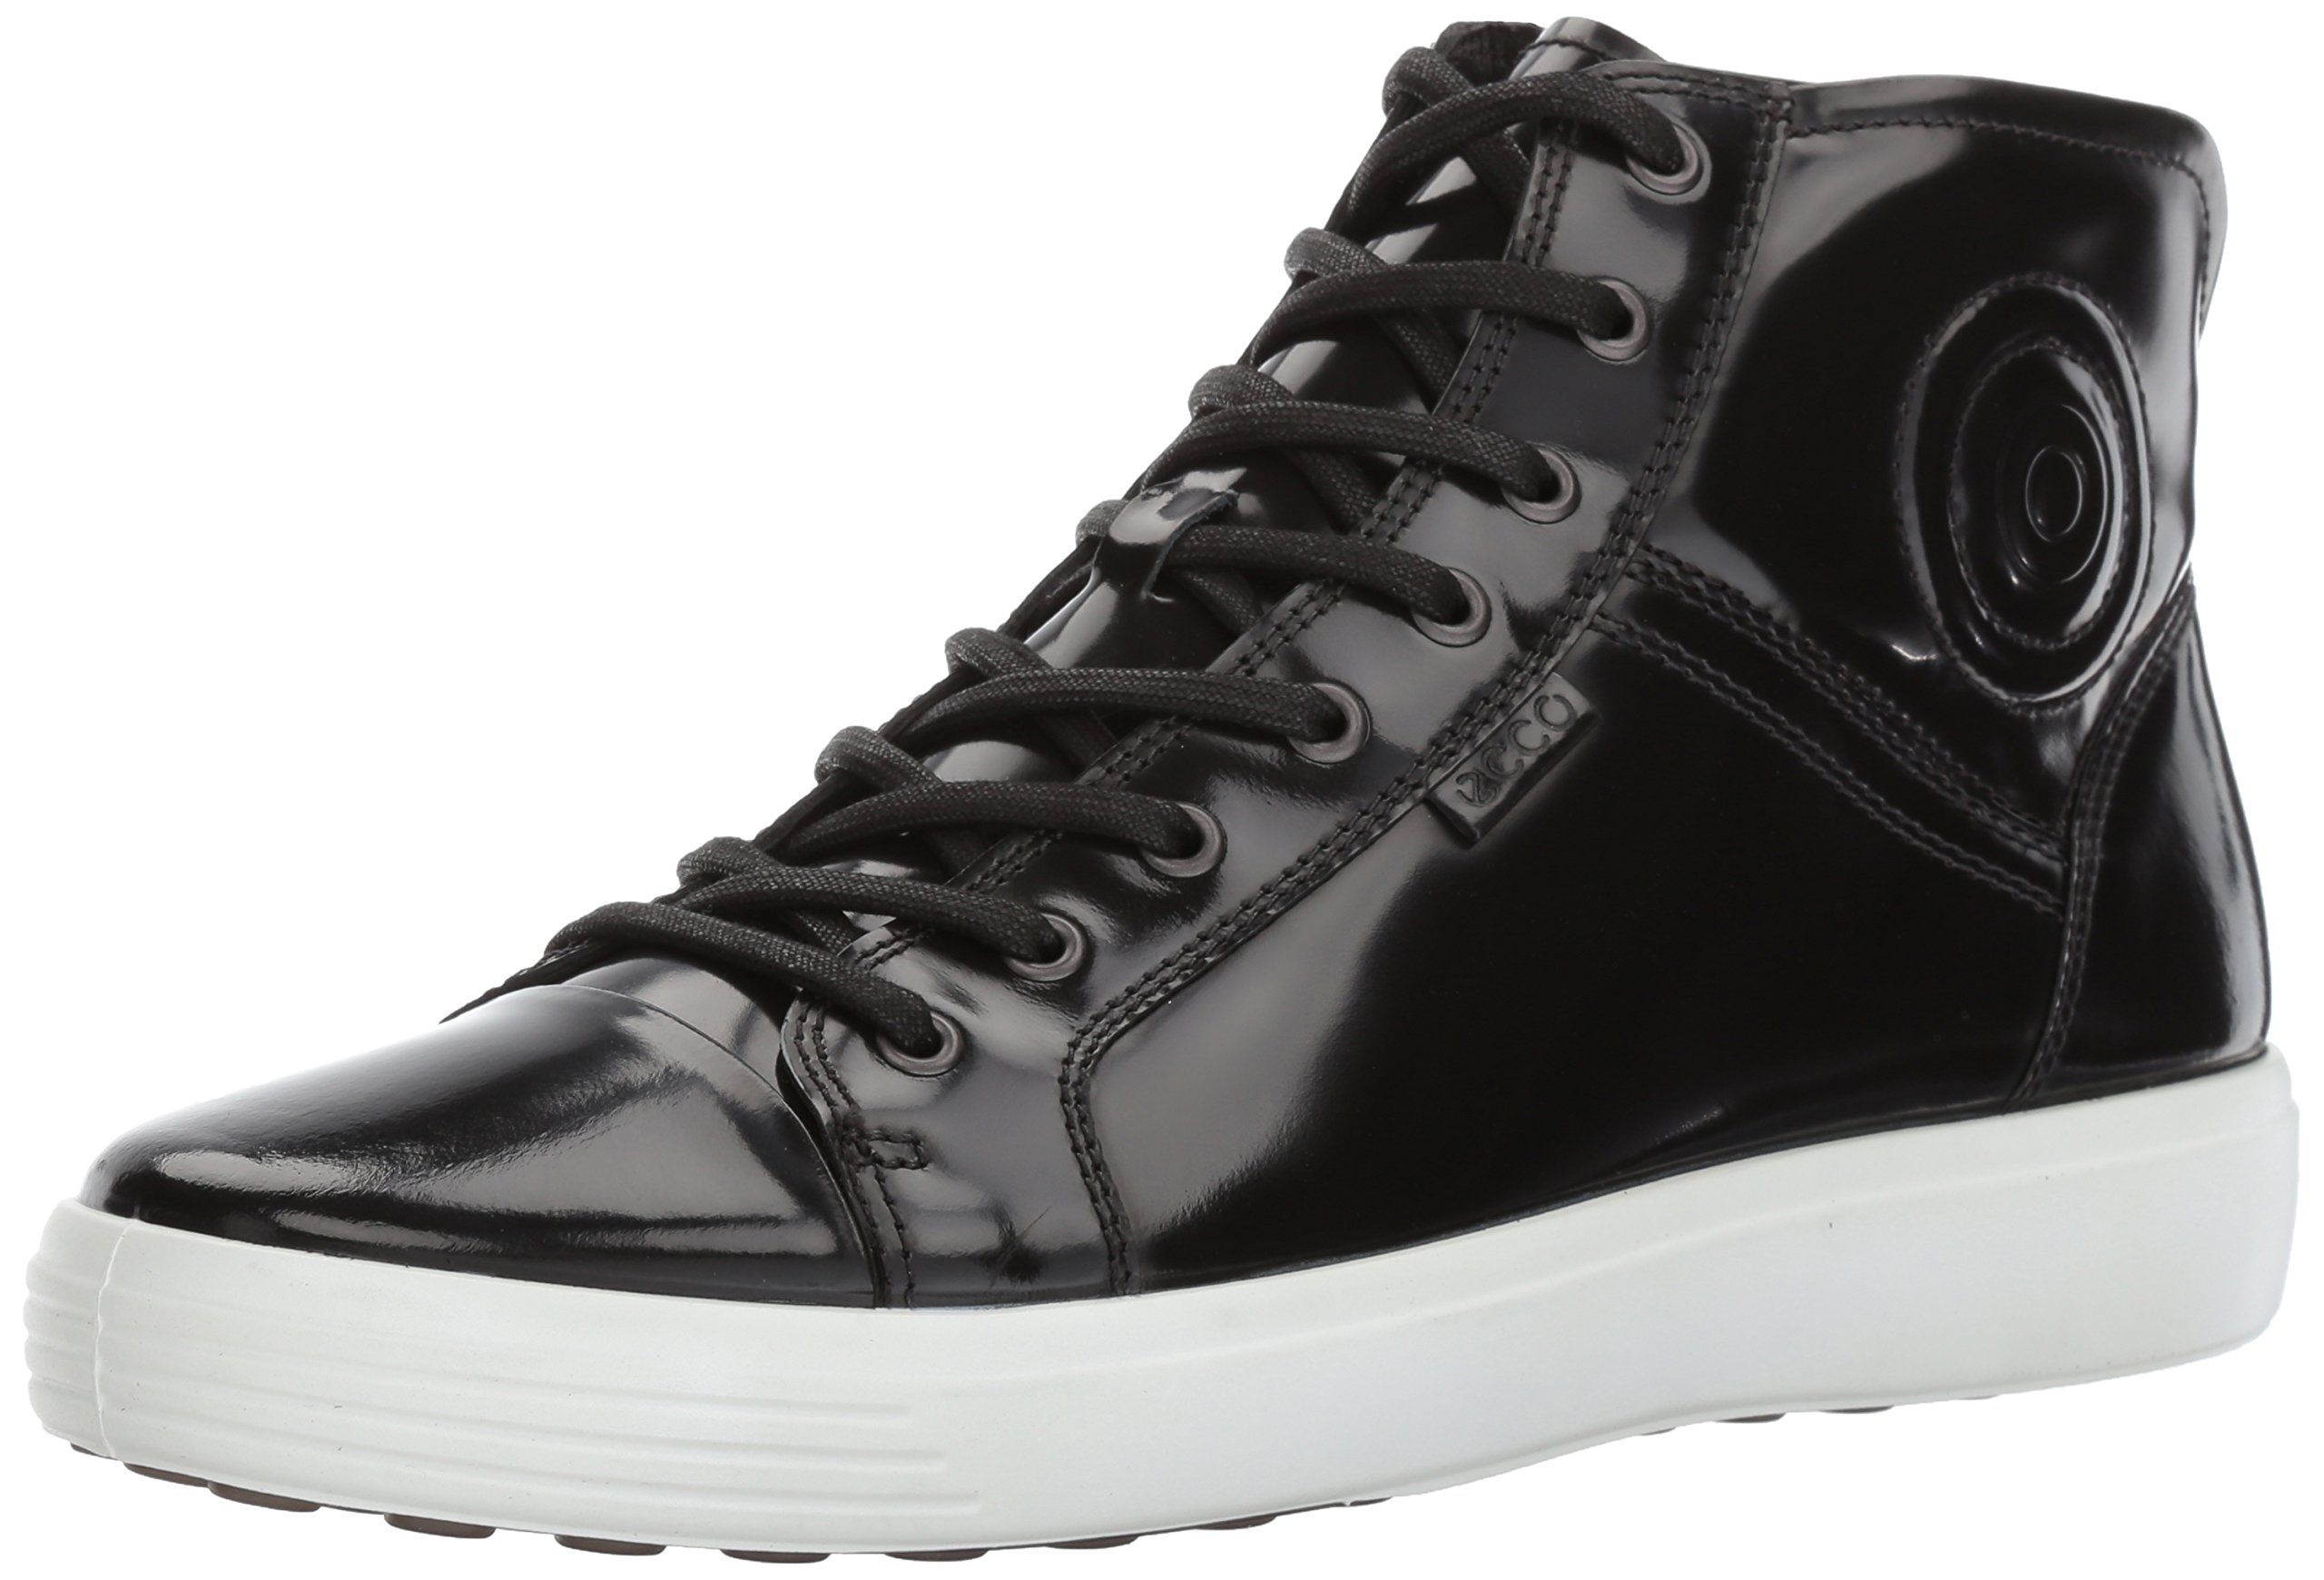 ECCO Men's Soft 7 Premium Boot Fashion Sneaker, Black Patent, 42 M EU/8-8.5 D(M) US